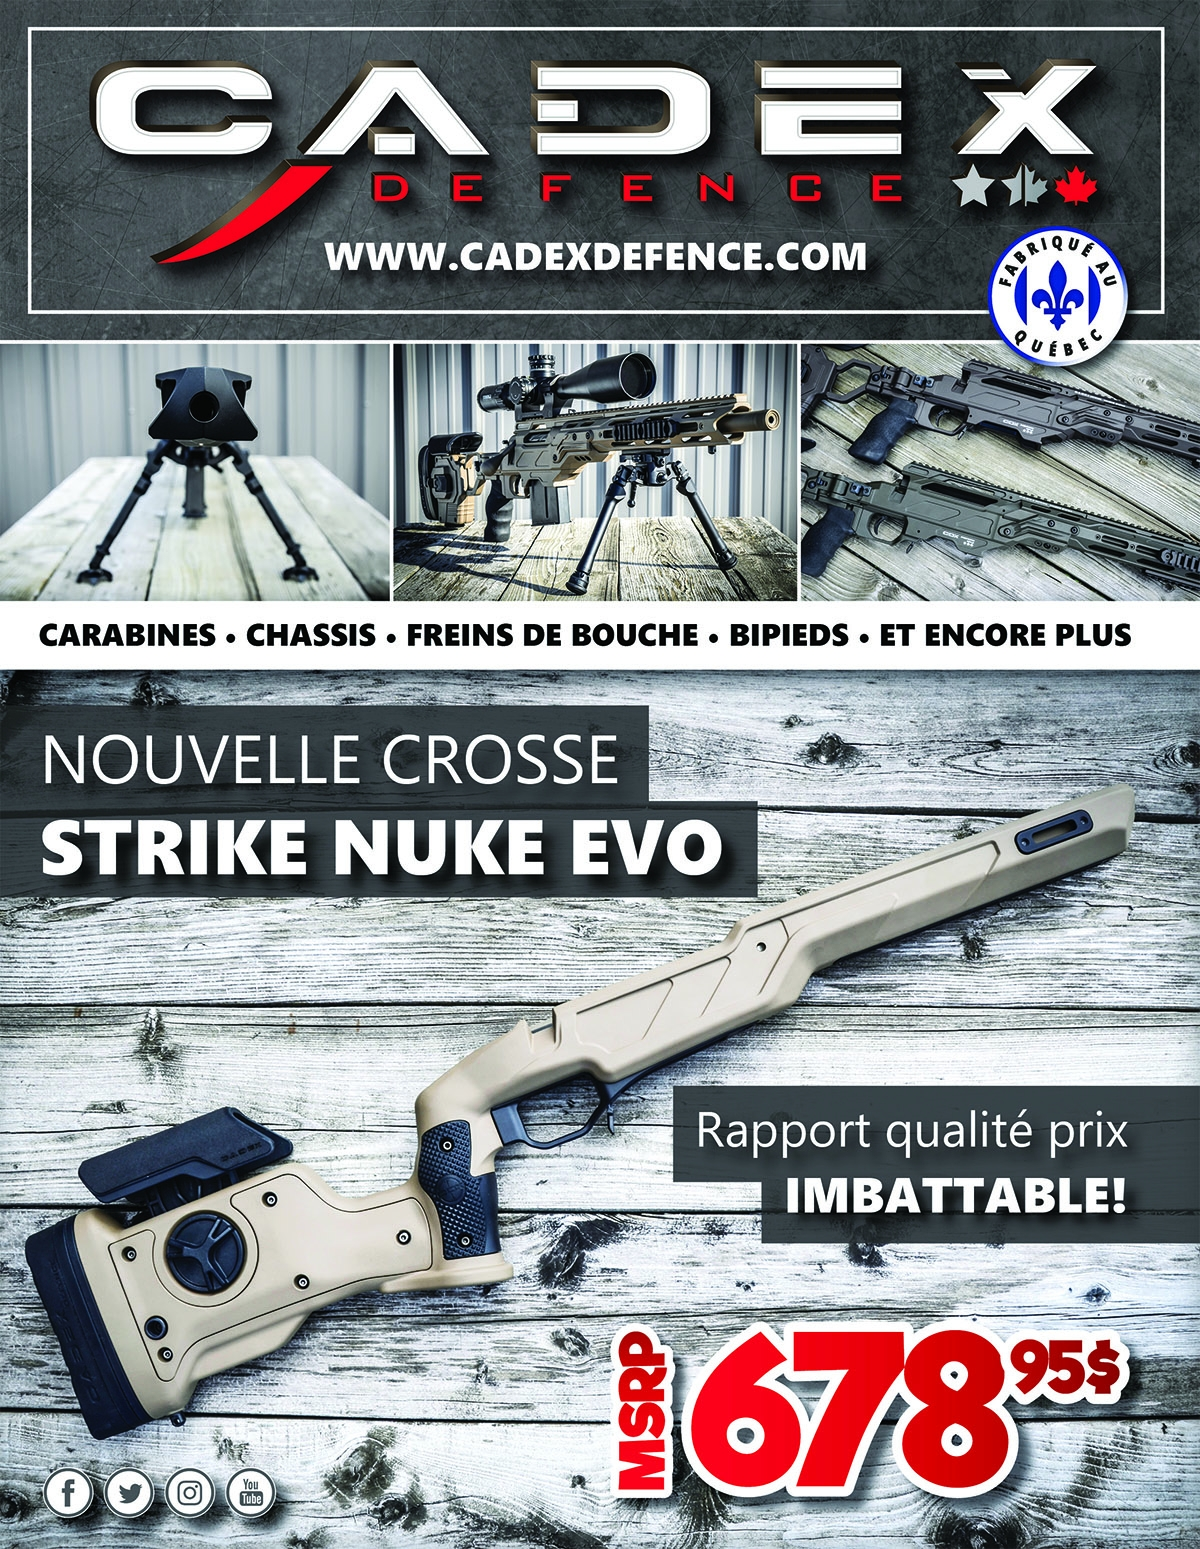 Cadex Defence